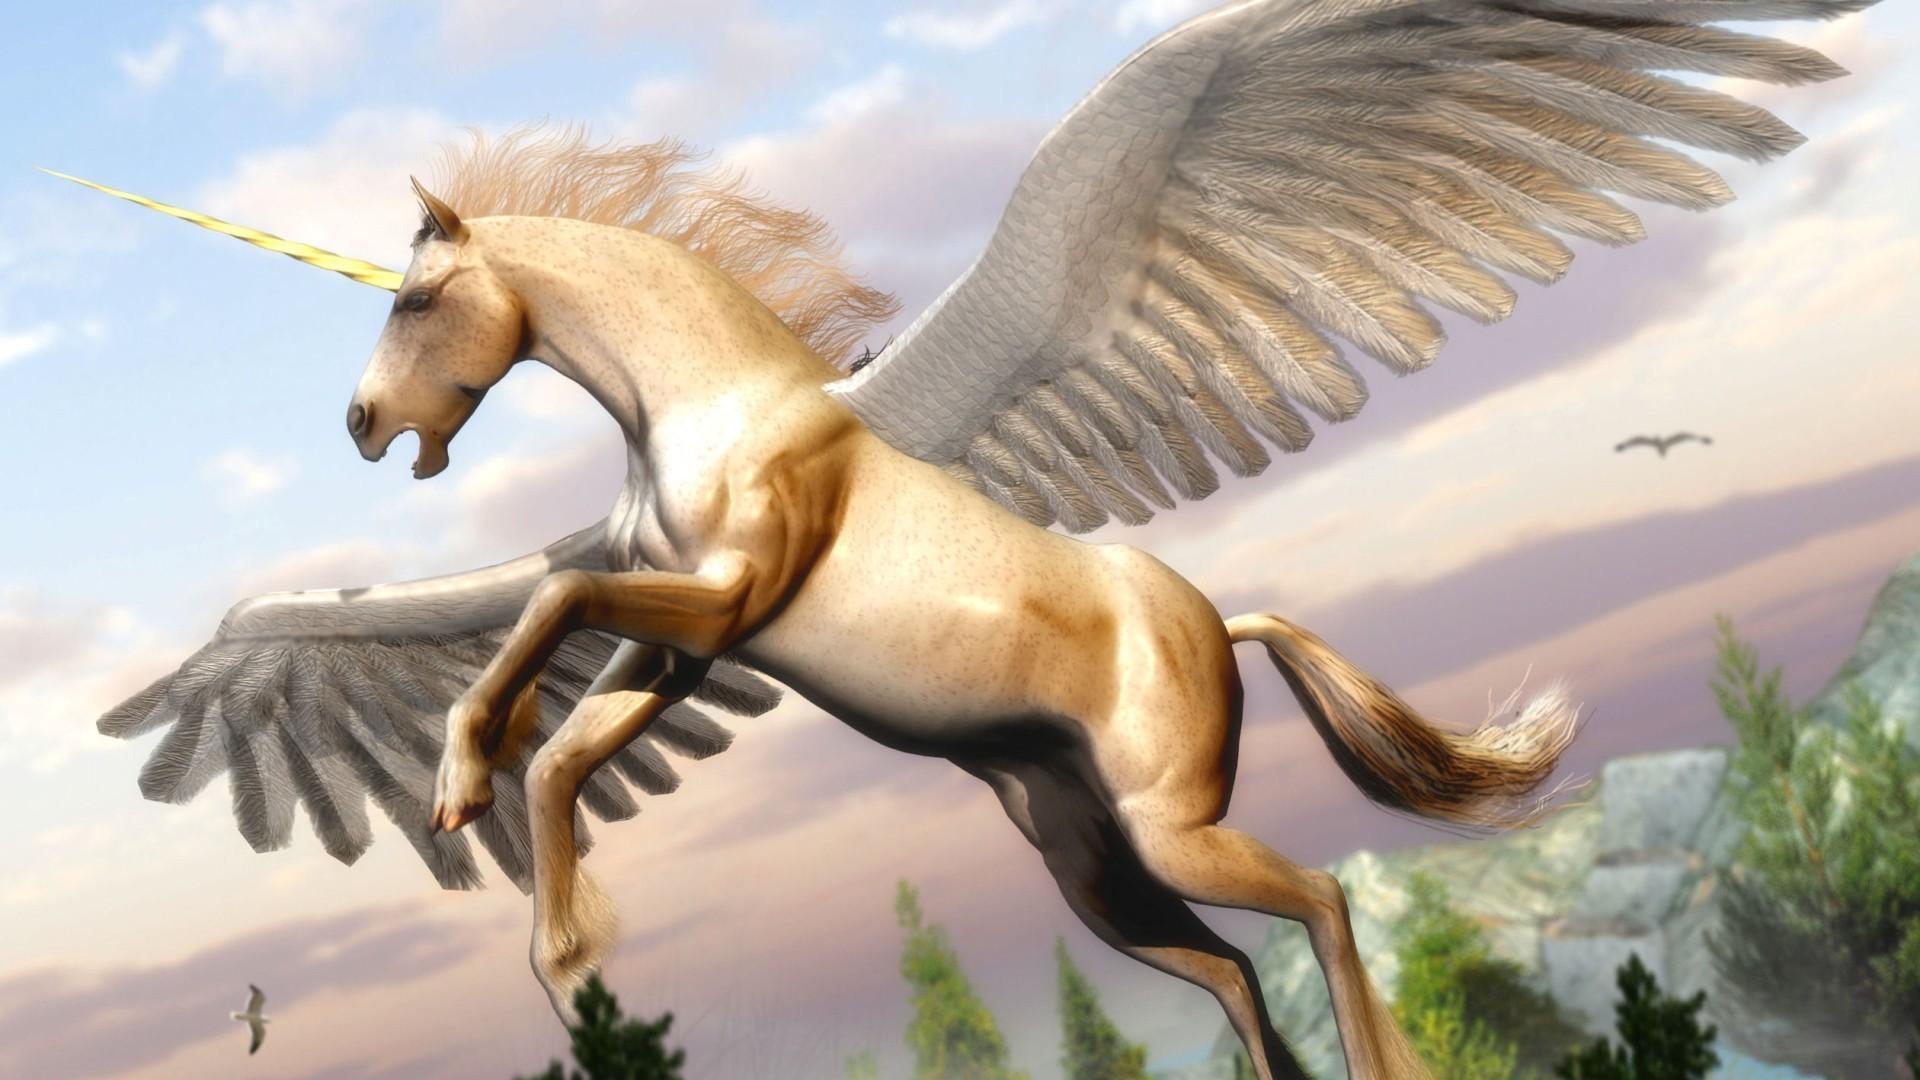 Pegasus wallpaper picture hd